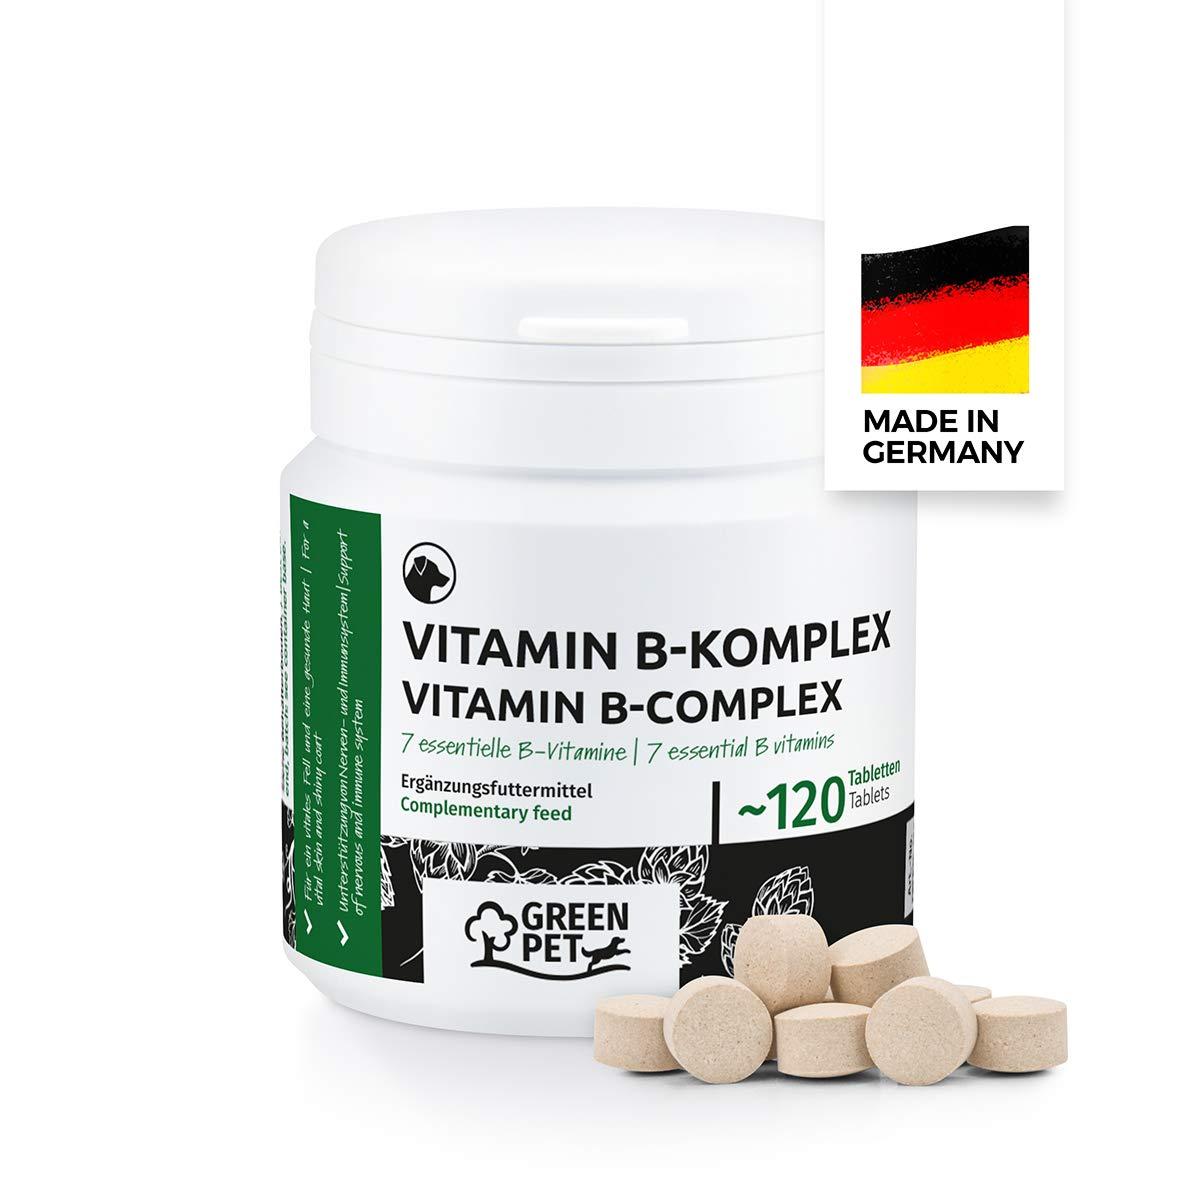 GreenPet Vitamin B Complex, Vitamin B+ Supplement for Dogs